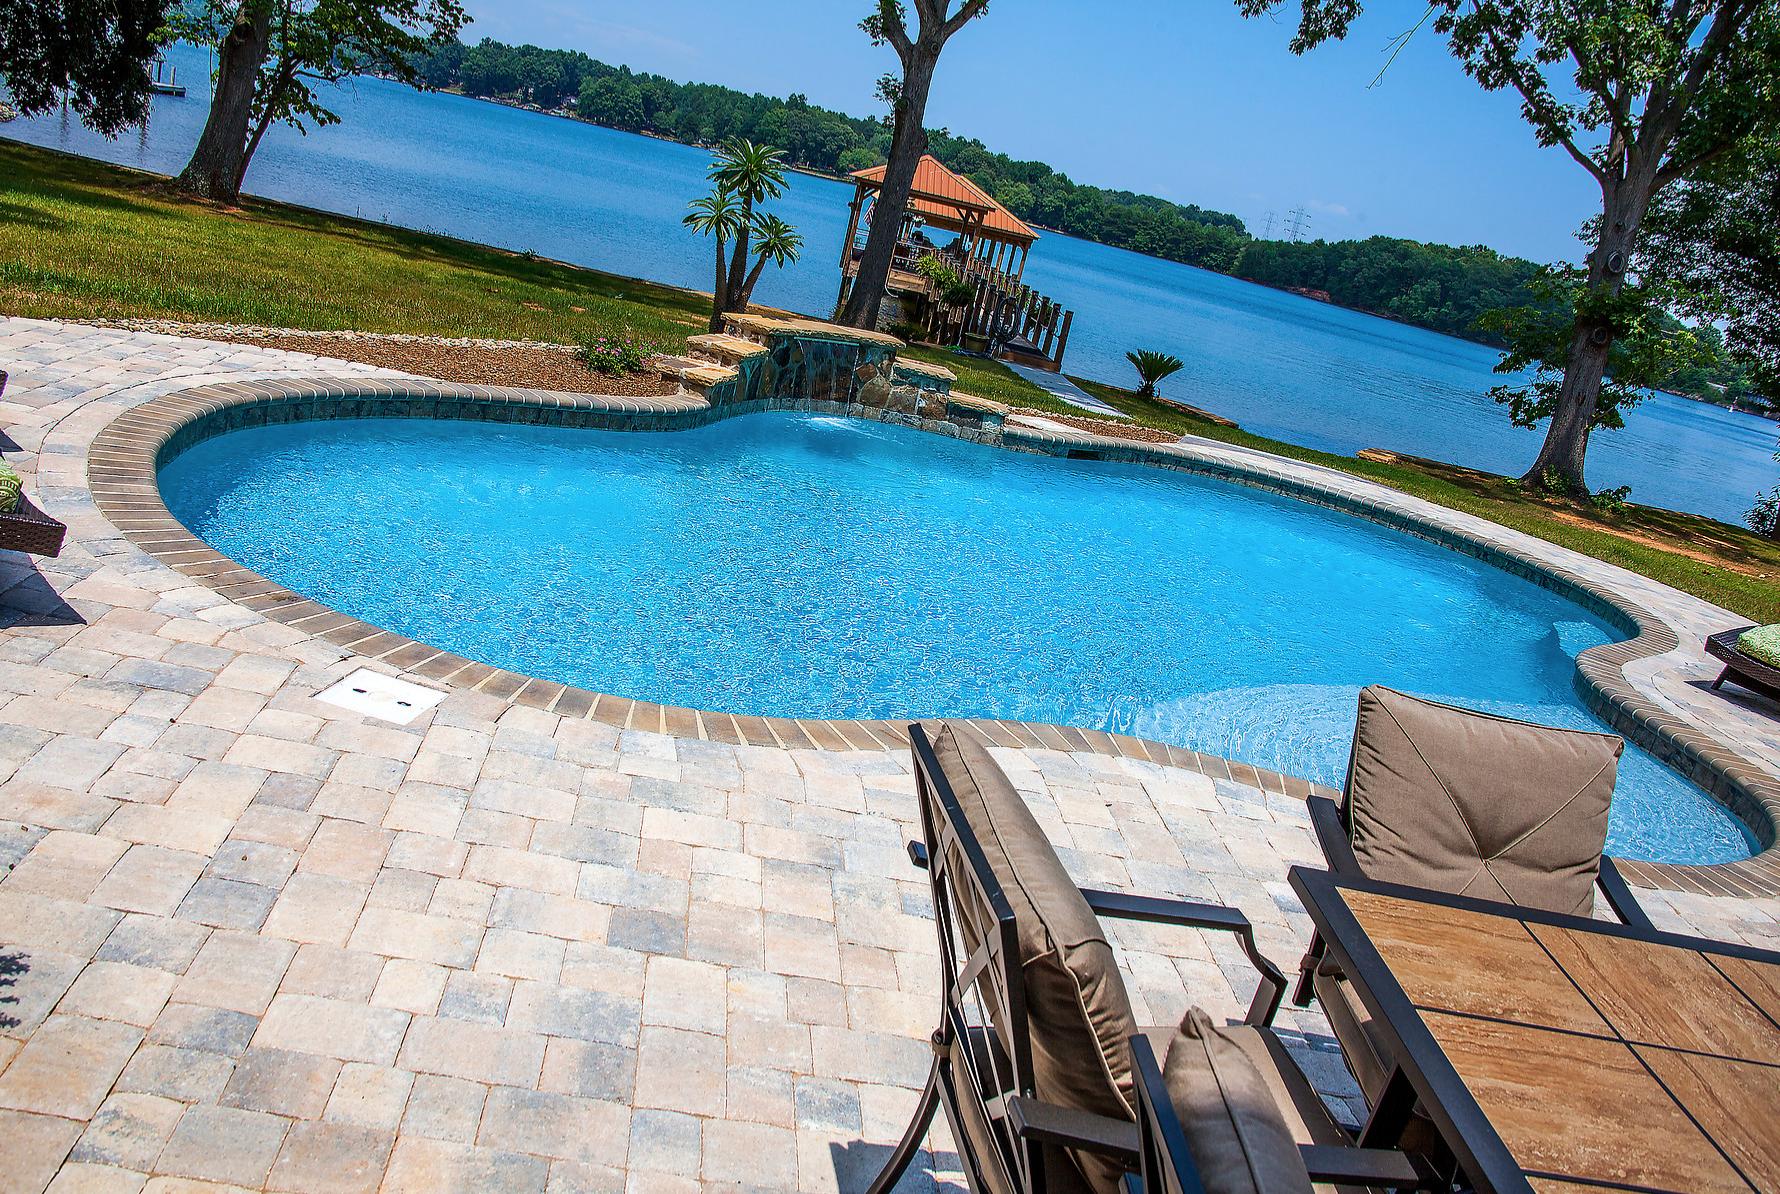 Inground Concrete Pools Installed in Cornelius North Carolina 704-799-5236 by CPC Pools